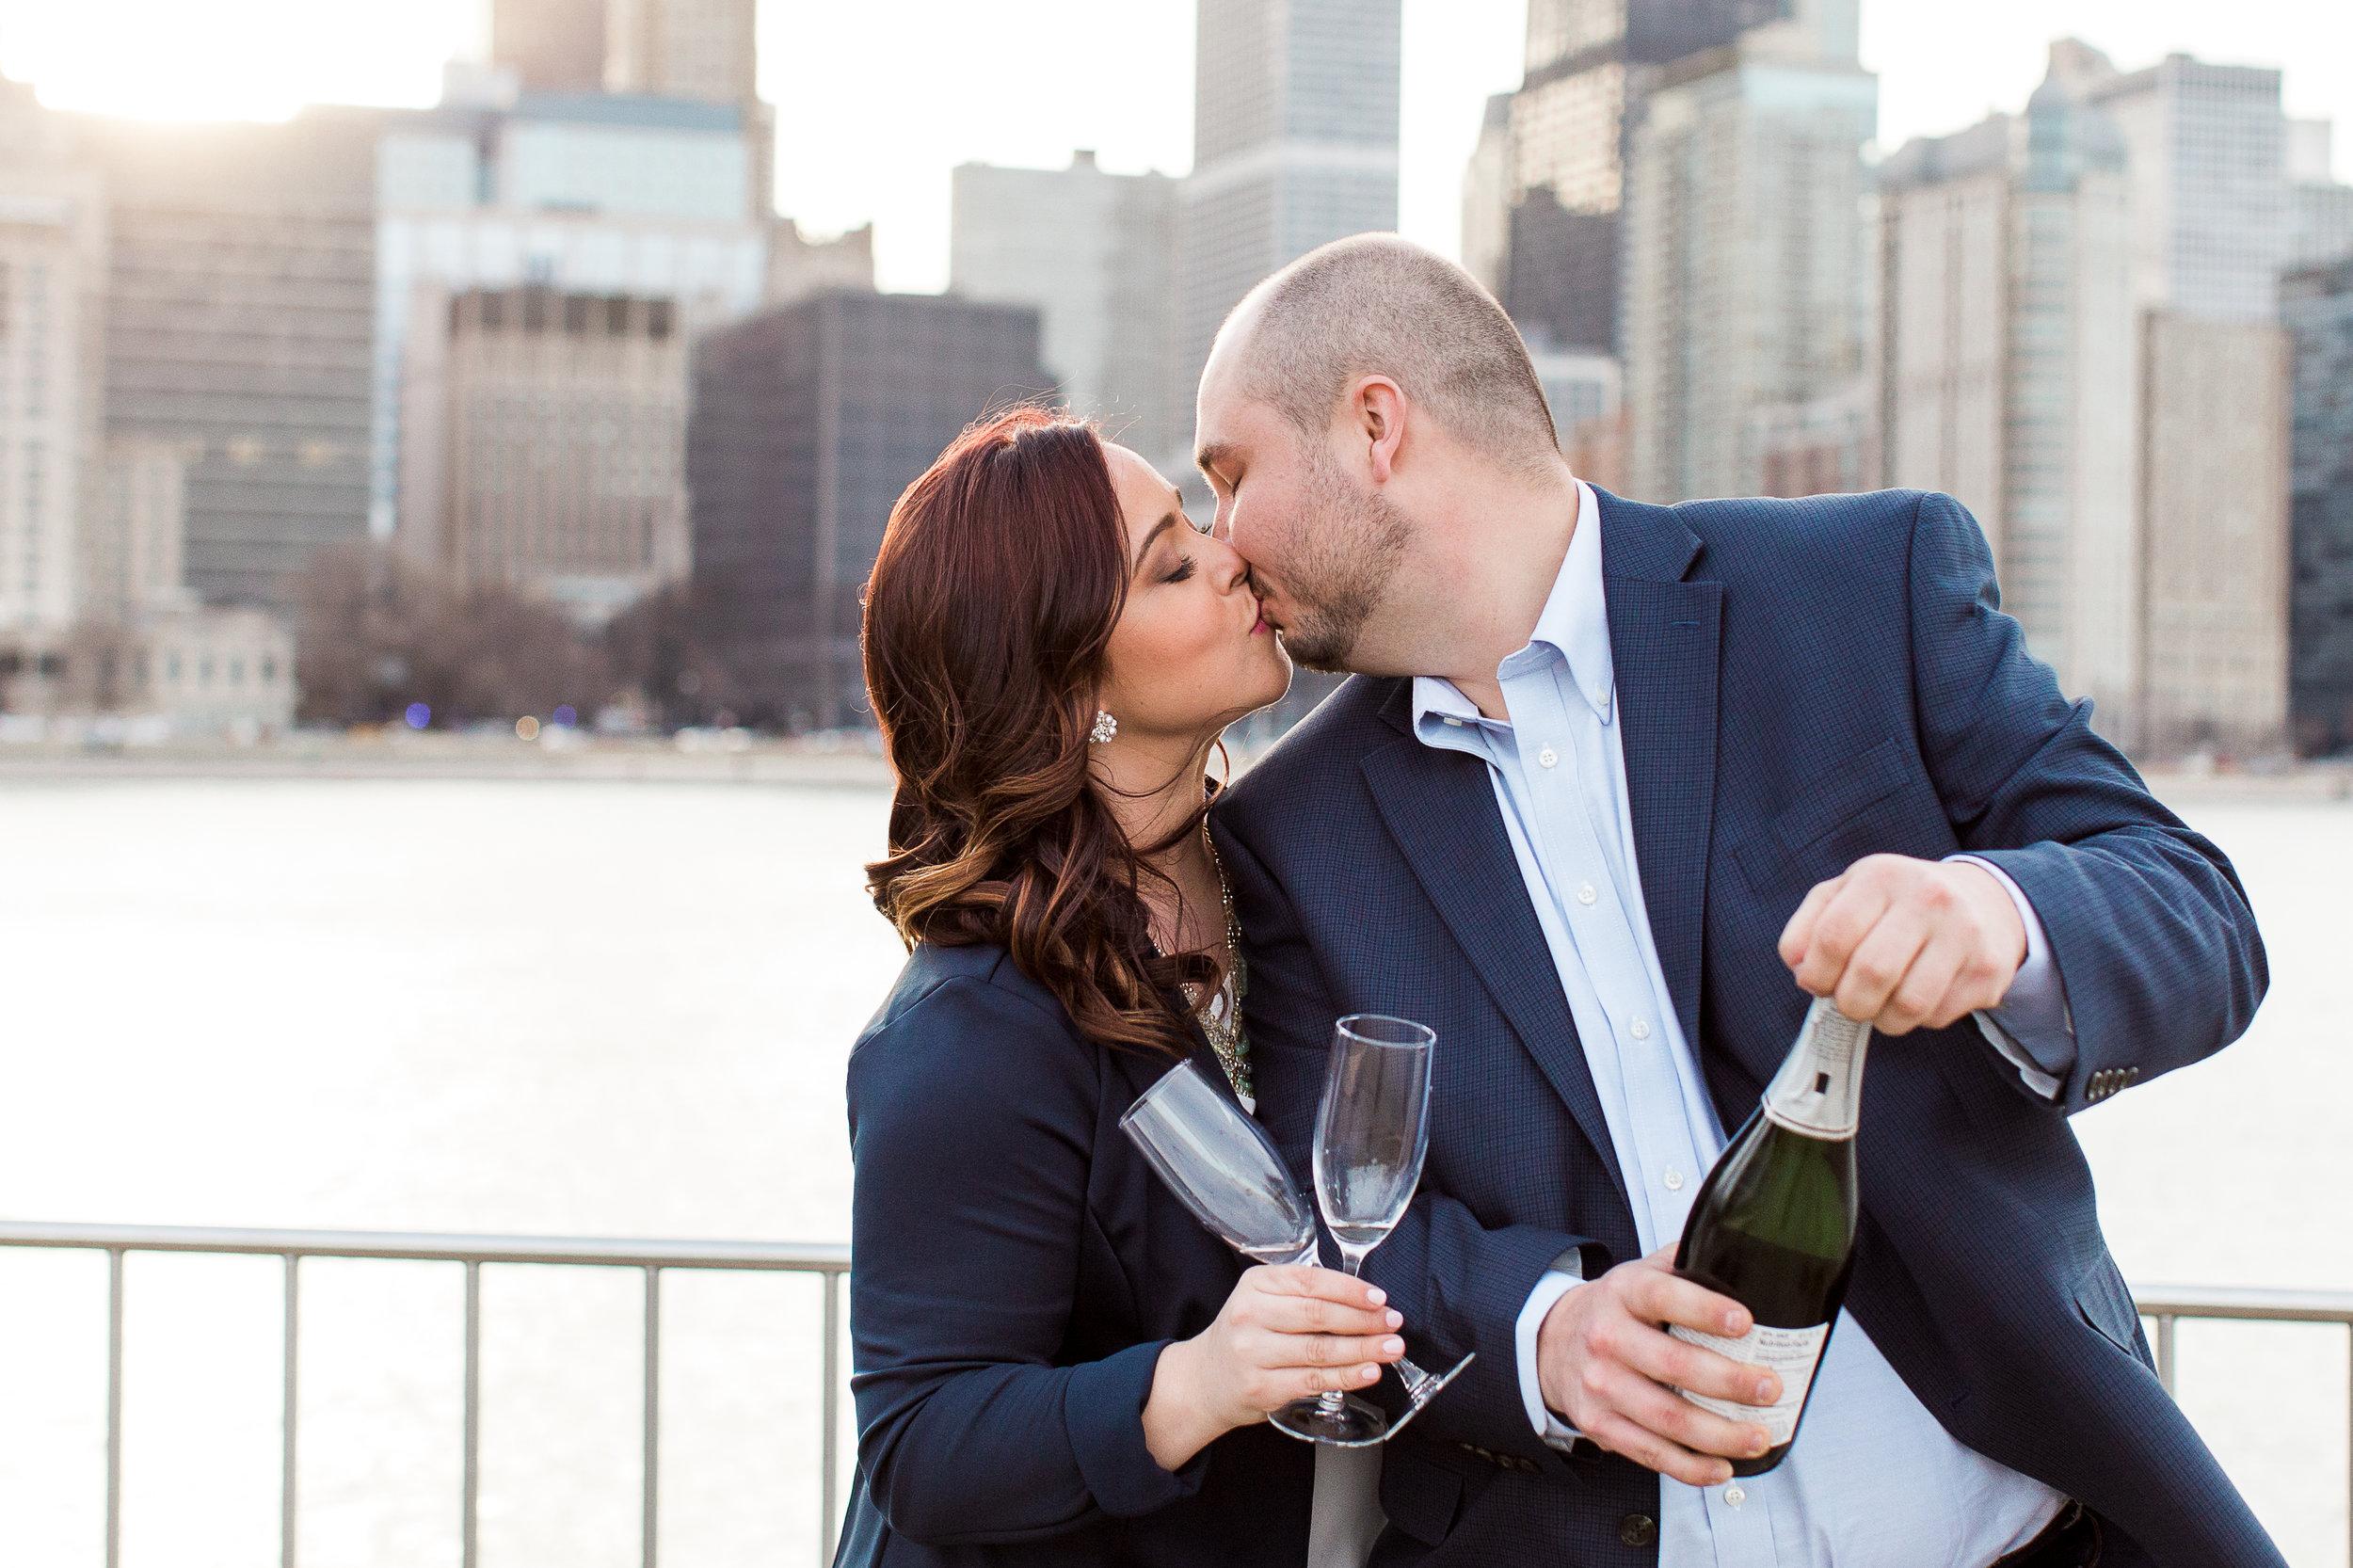 chicago-engagement-photographer-classy-olive-park-downtown-wedding-kristen-cloyd-80.jpg